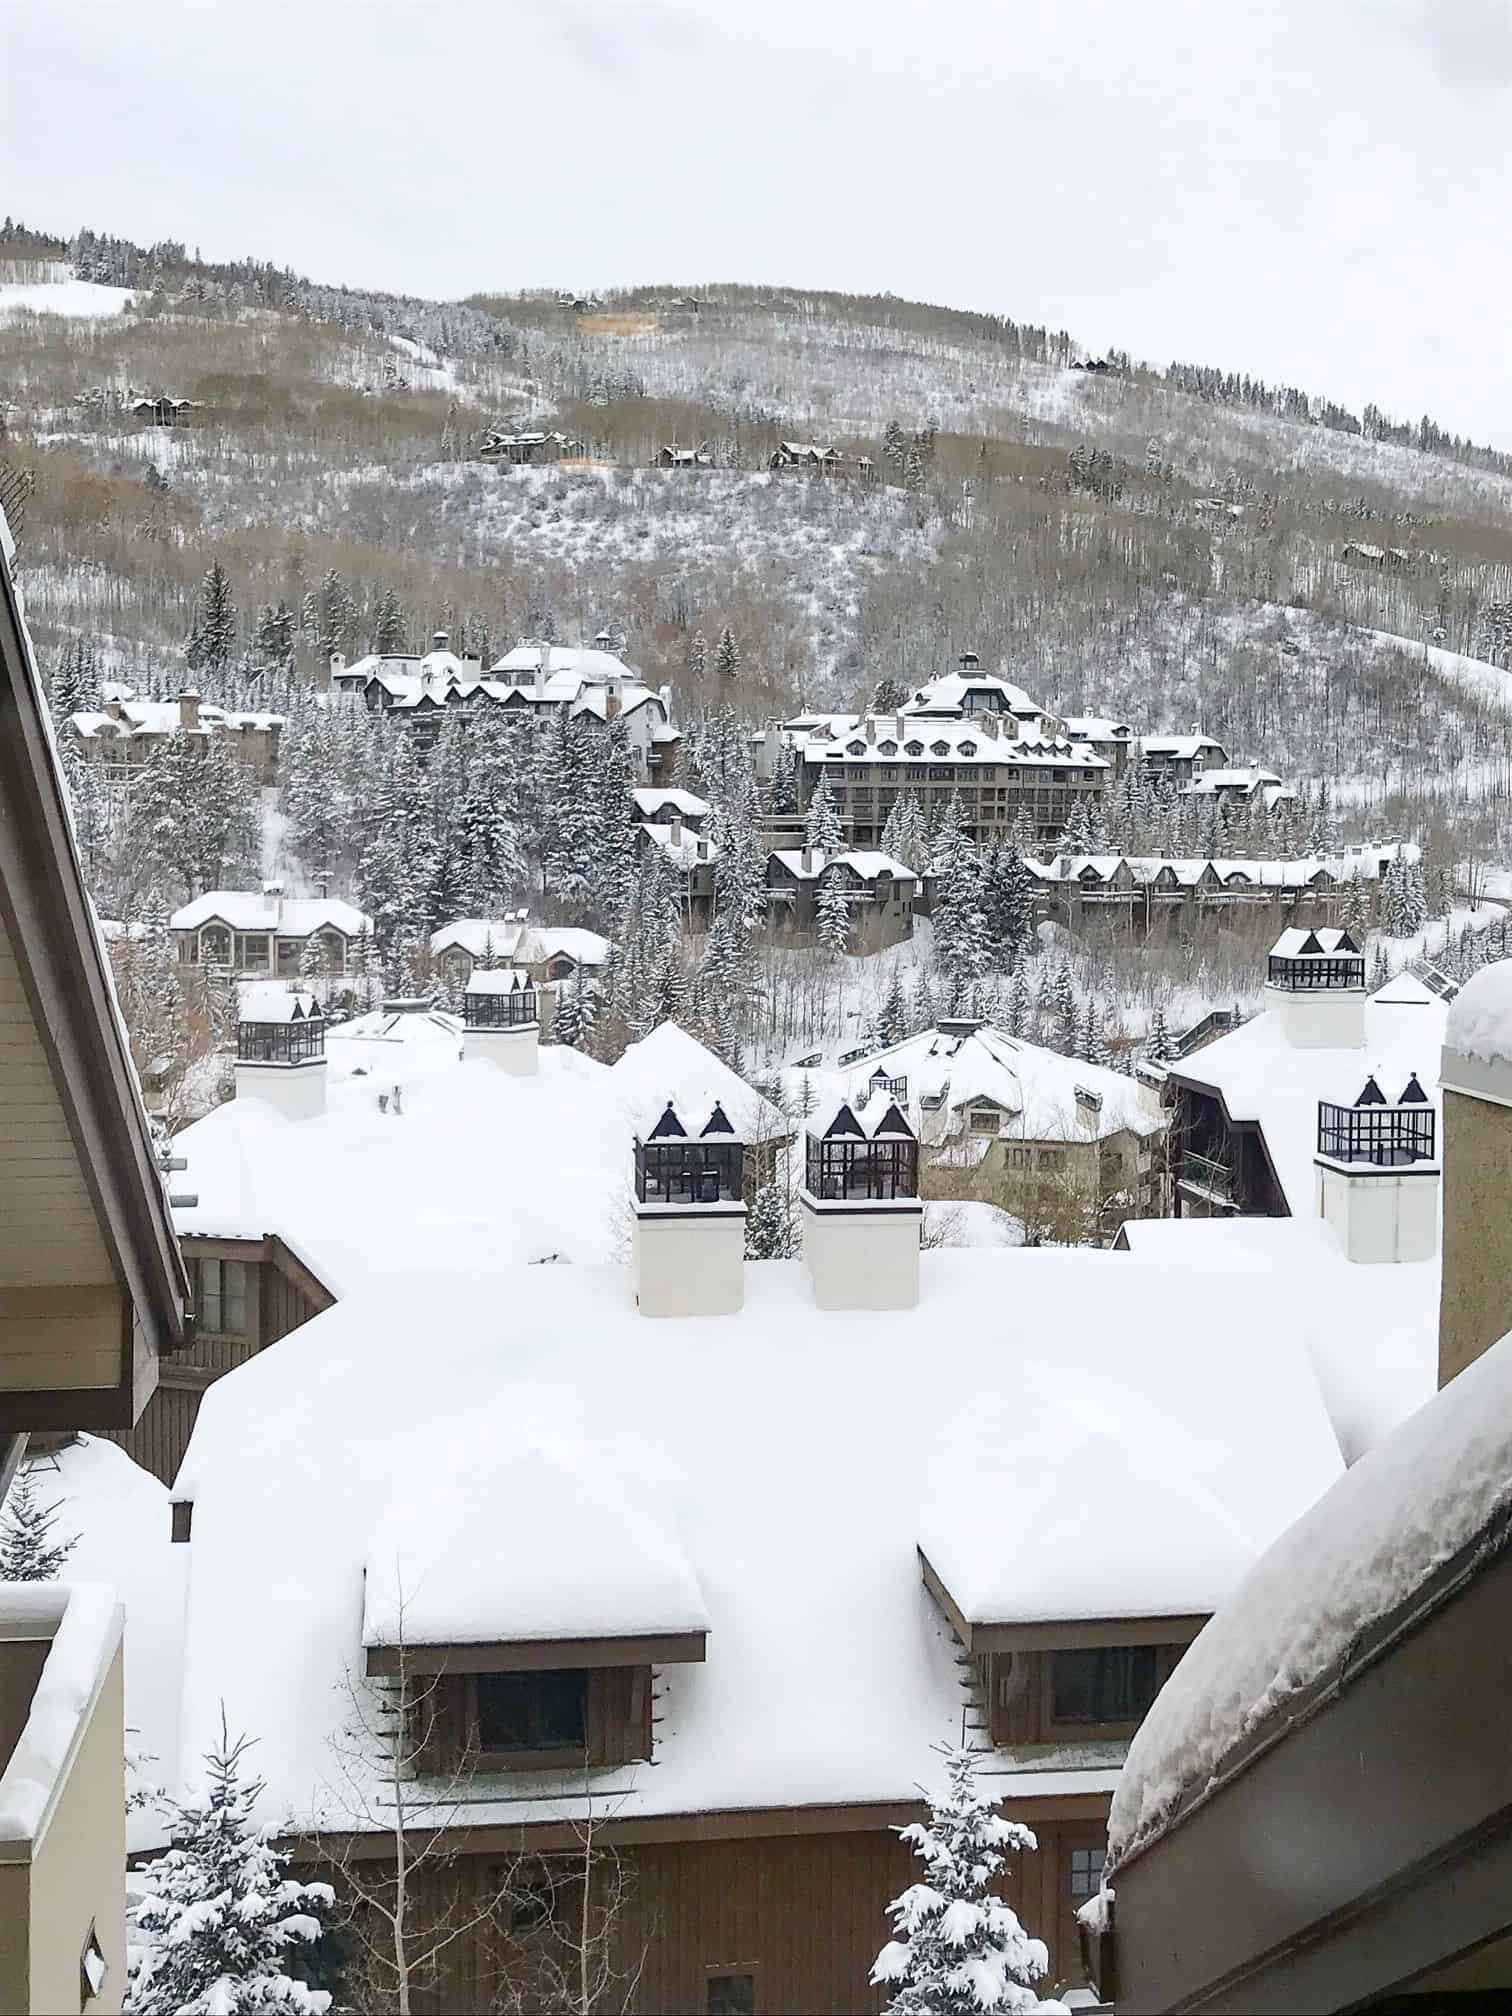 How to Plan a Ski Trip for Your Family by popular lifestyle blog, Glamorous Versatility: image of Beaver Creek Ski Resort in Avon, Colorado.